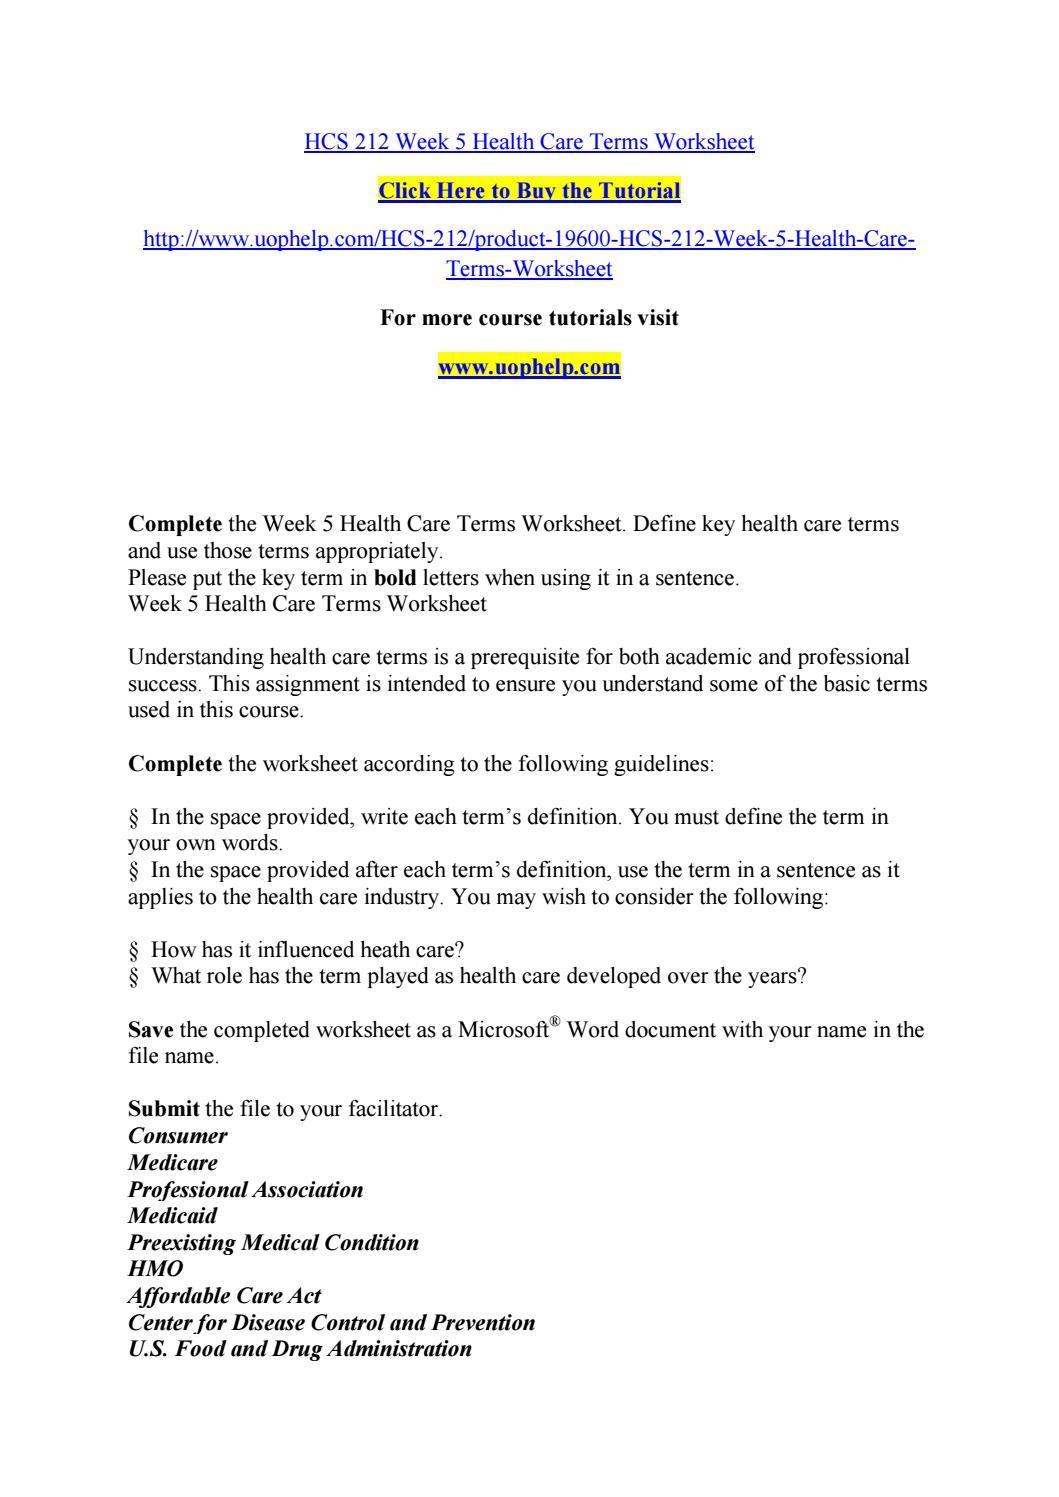 Hcs 212 week 5 health care terms worksheet by ...